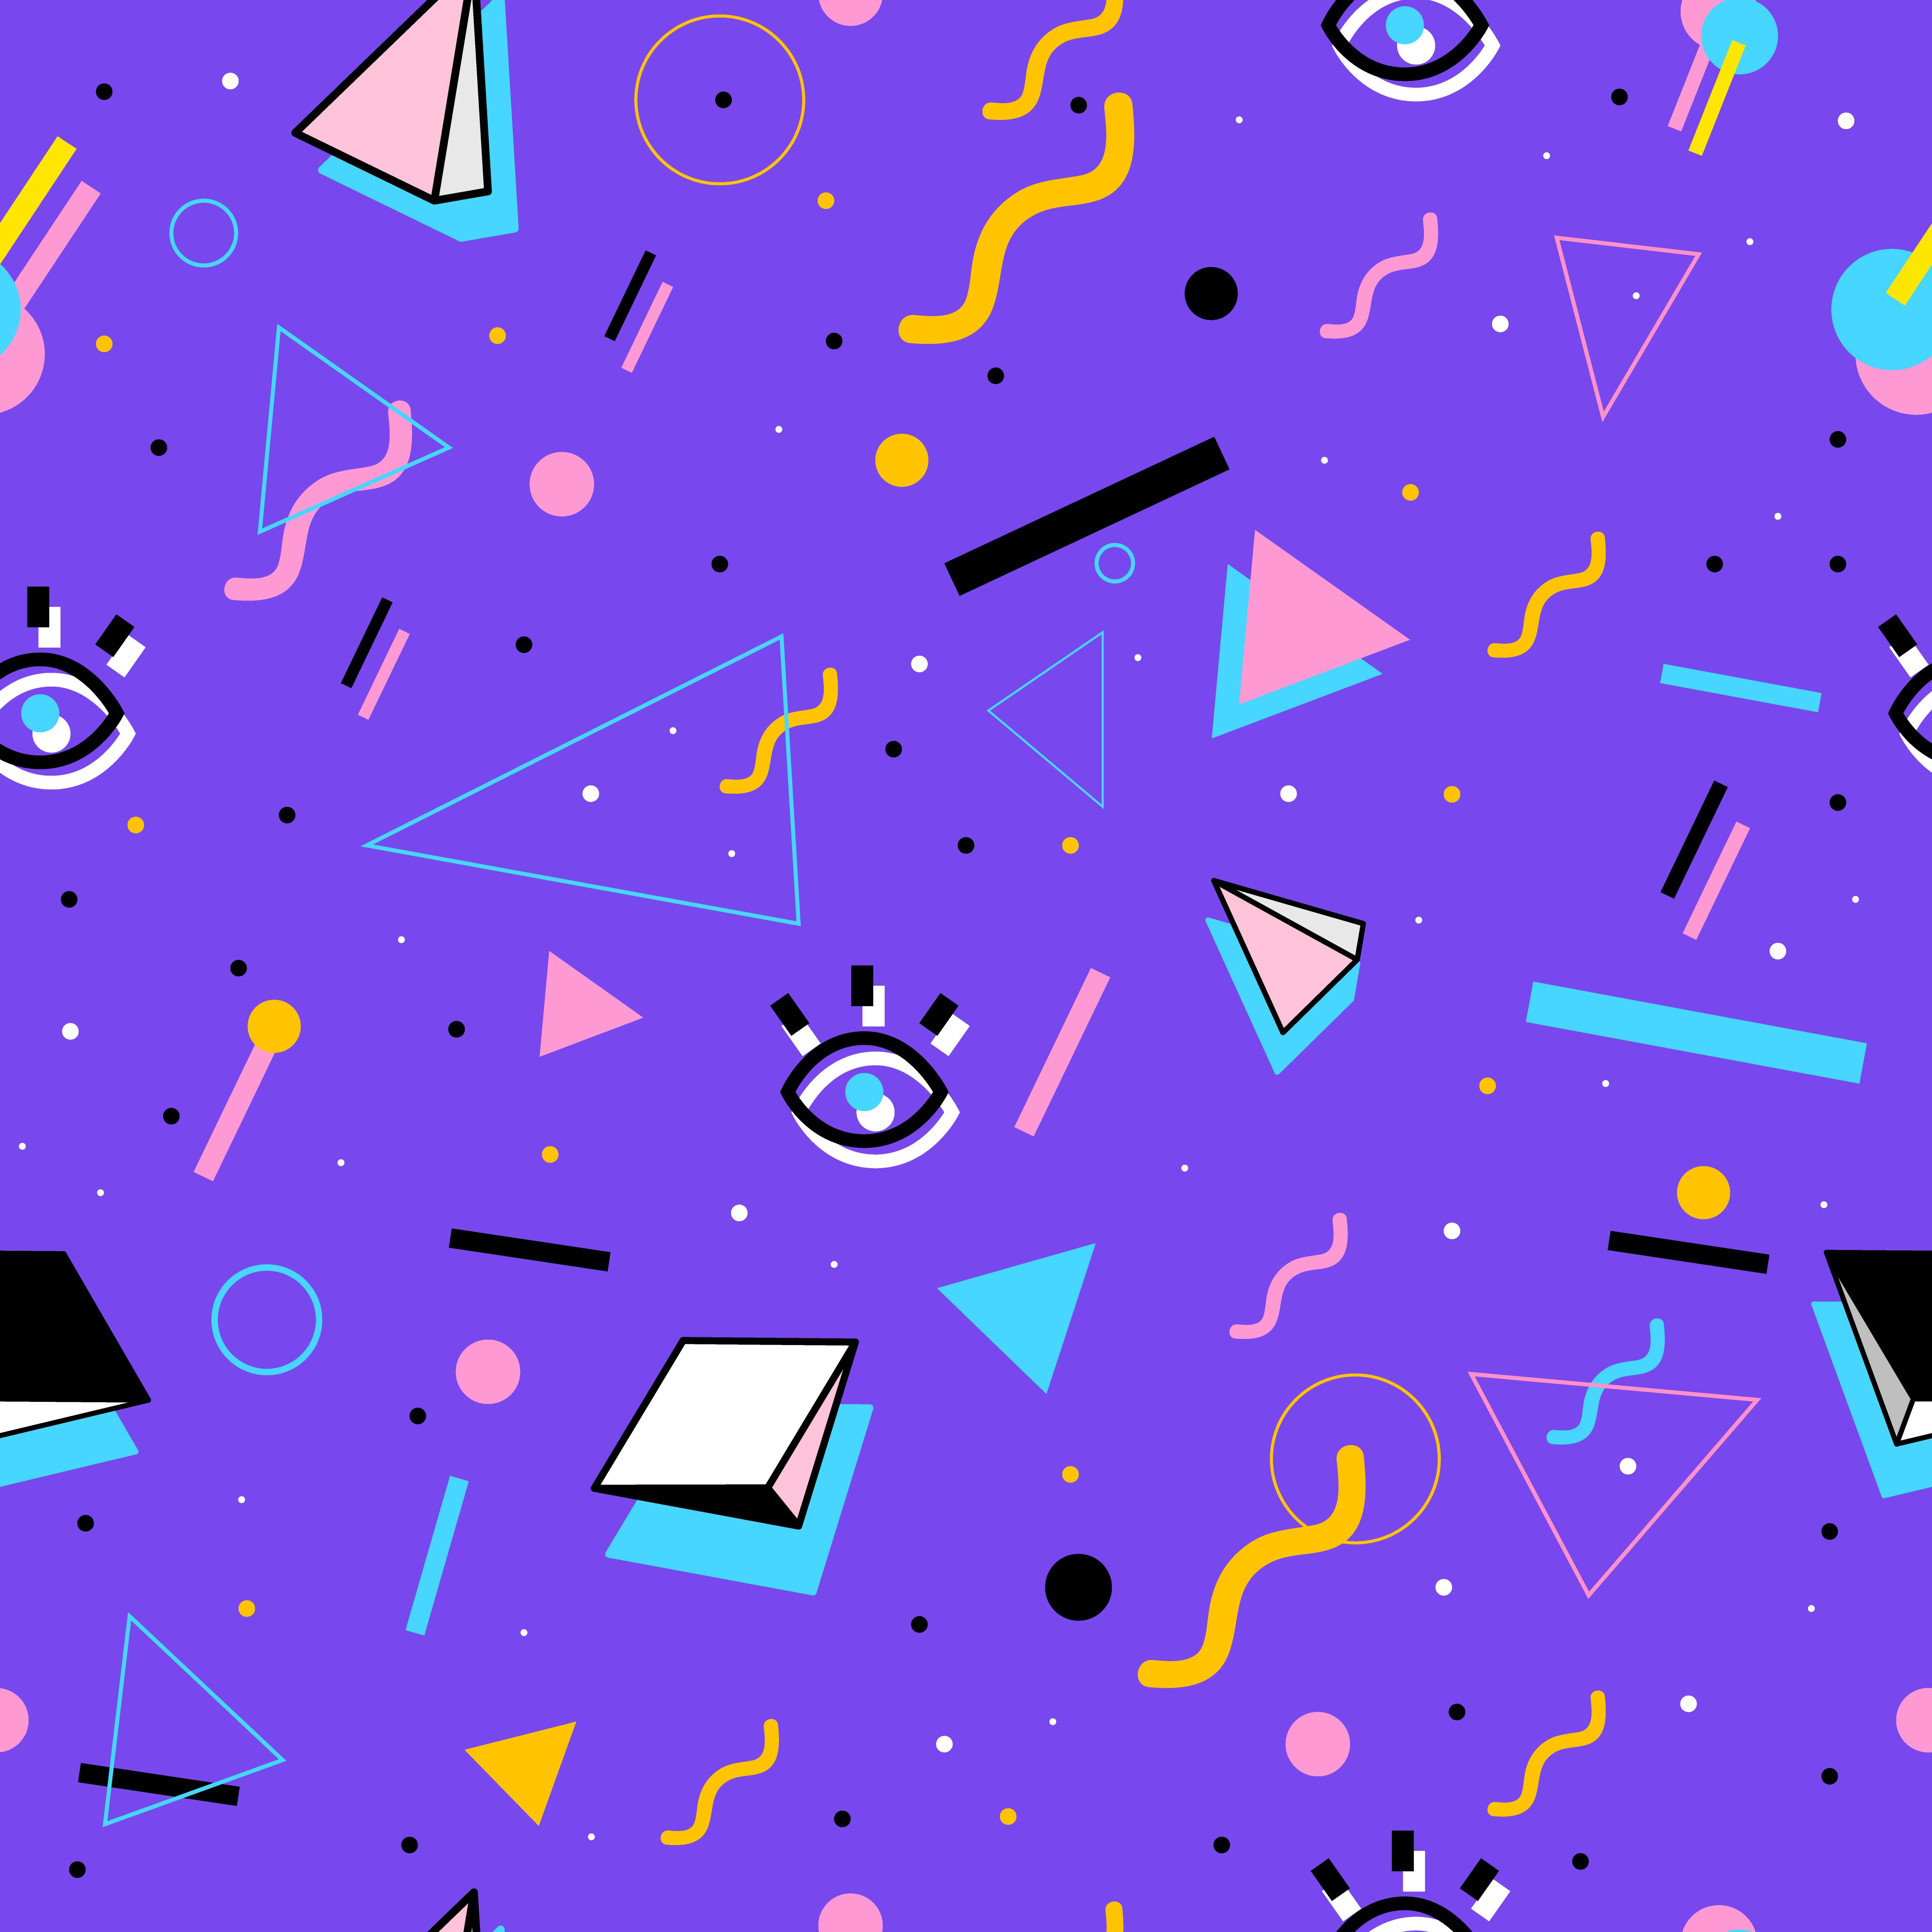 80's style pattern | Pattern-like | 80s design, Retro art